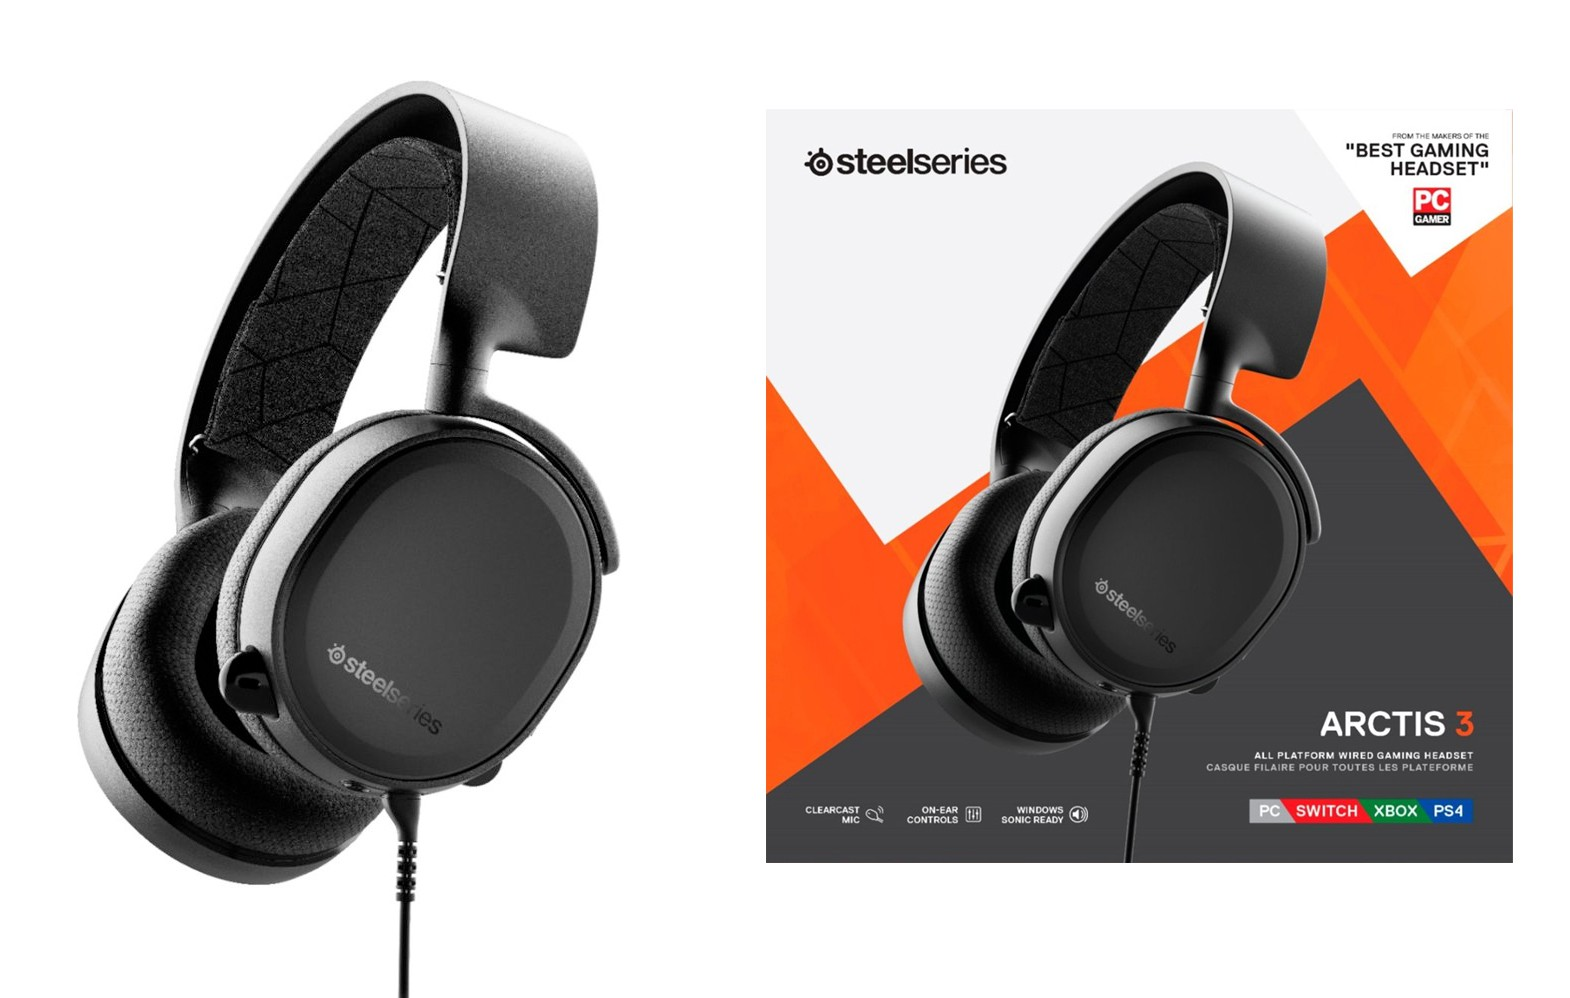 Steelseries Arctis 3 Black (2019 Edition) gaming headset